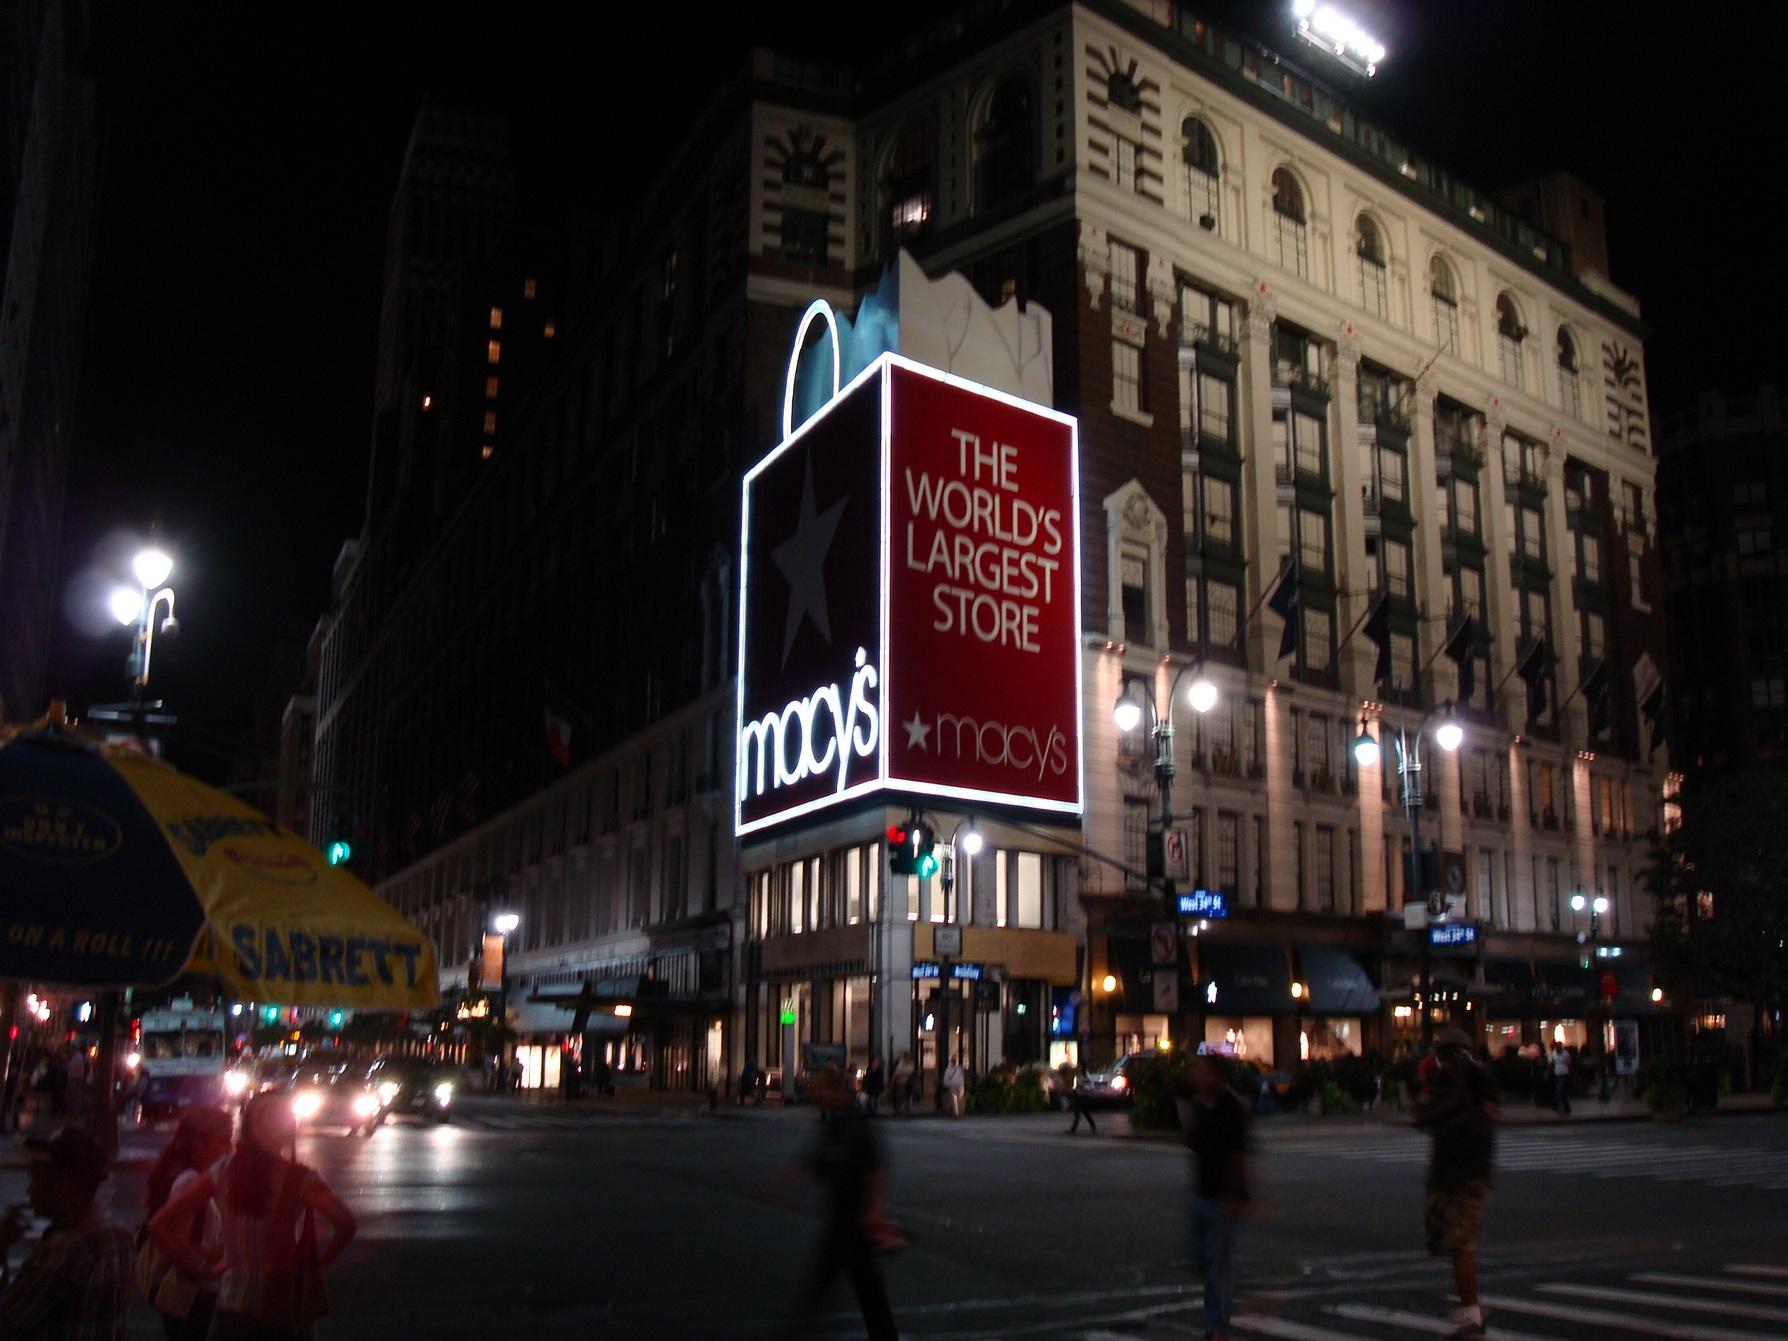 New York City_Macy's_TheWorldsLargestSotre